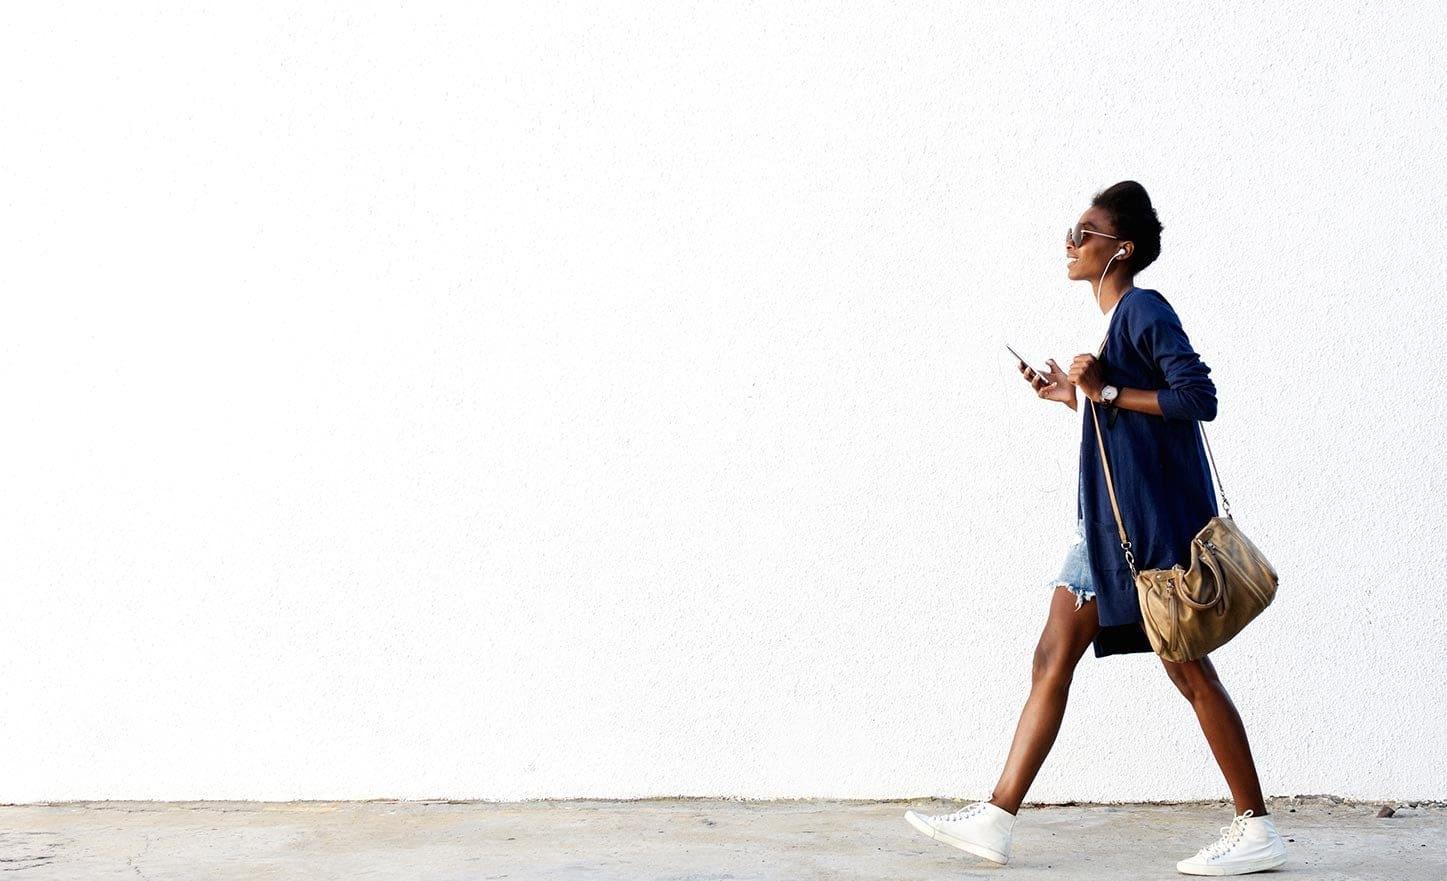 black-woman-walking